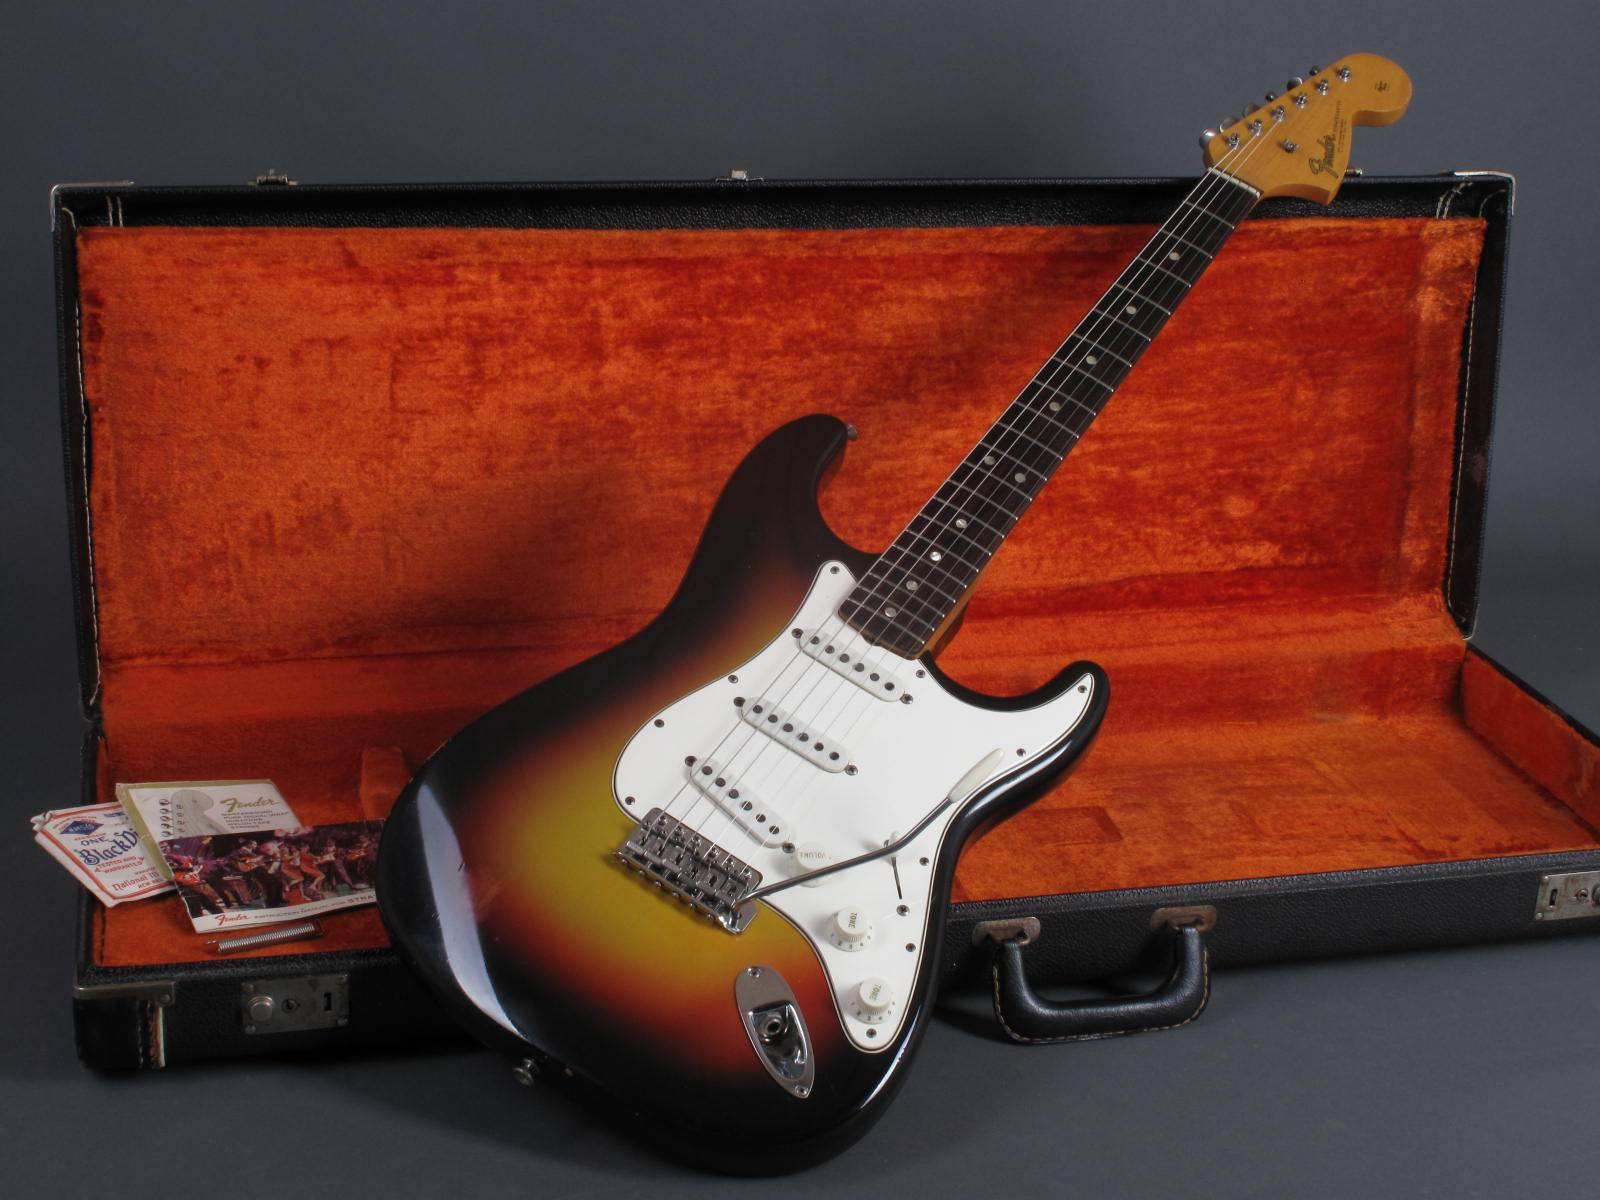 https://guitarpoint.de/app/uploads/products/1966-fender-stratocaster-3t-sunburst-clean/Fender66Str3tSB173506_14.jpg